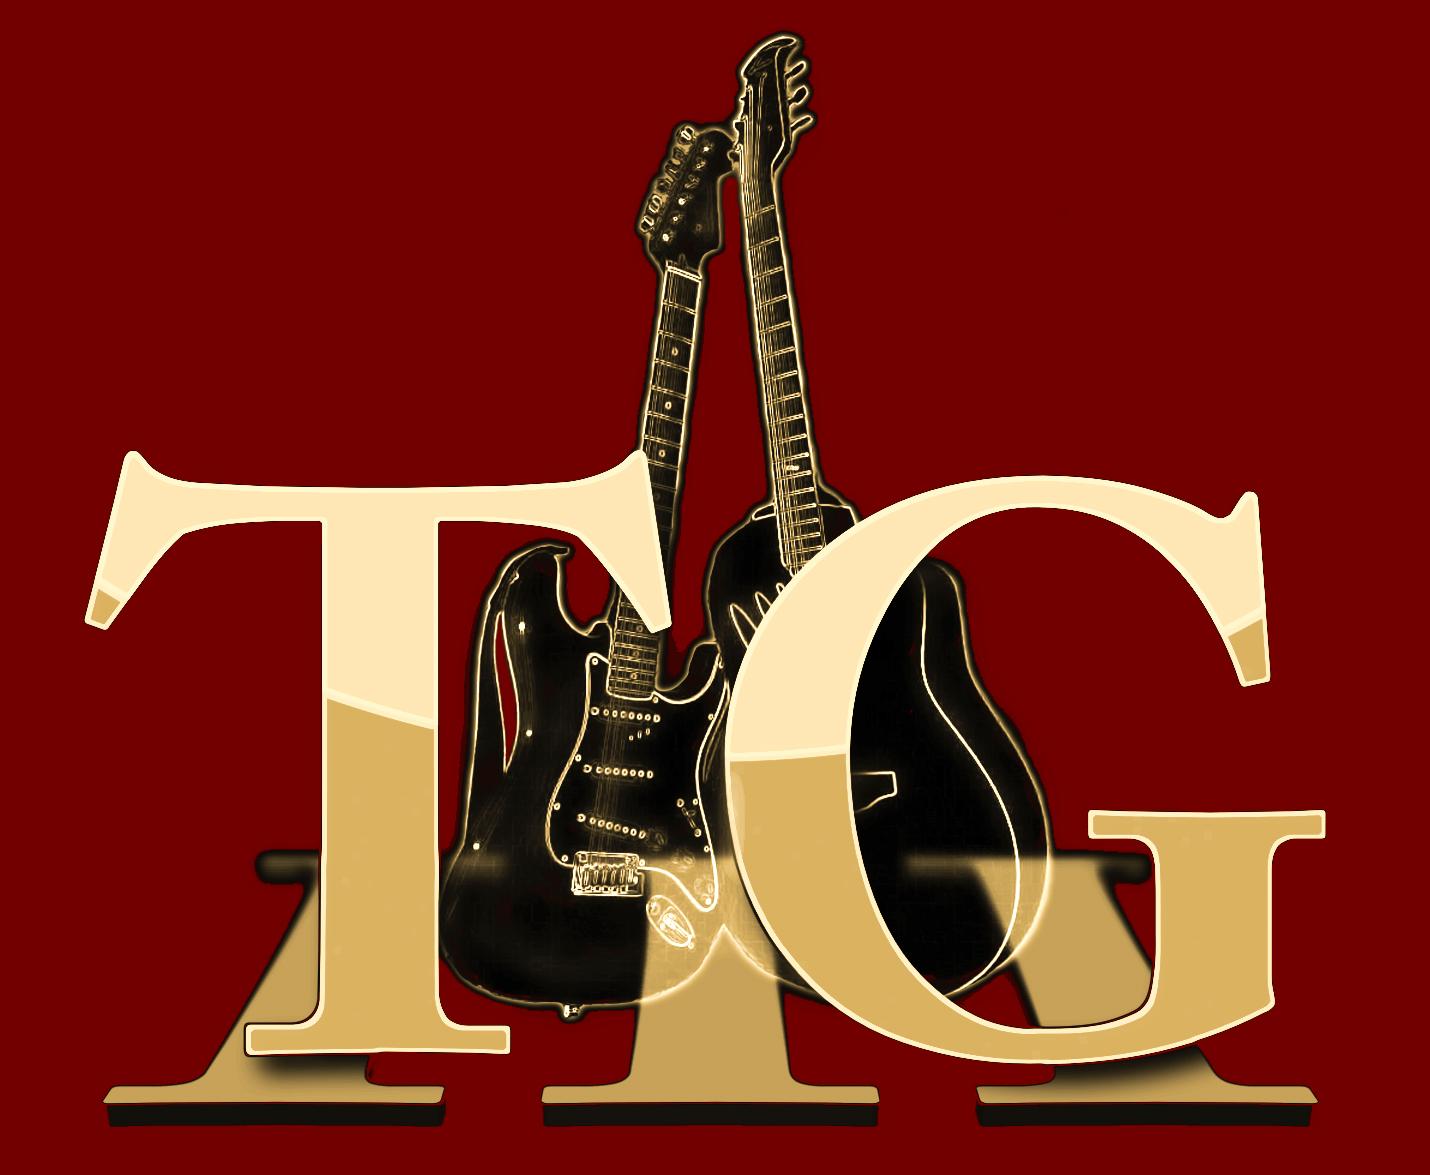 Tommy Grimes III